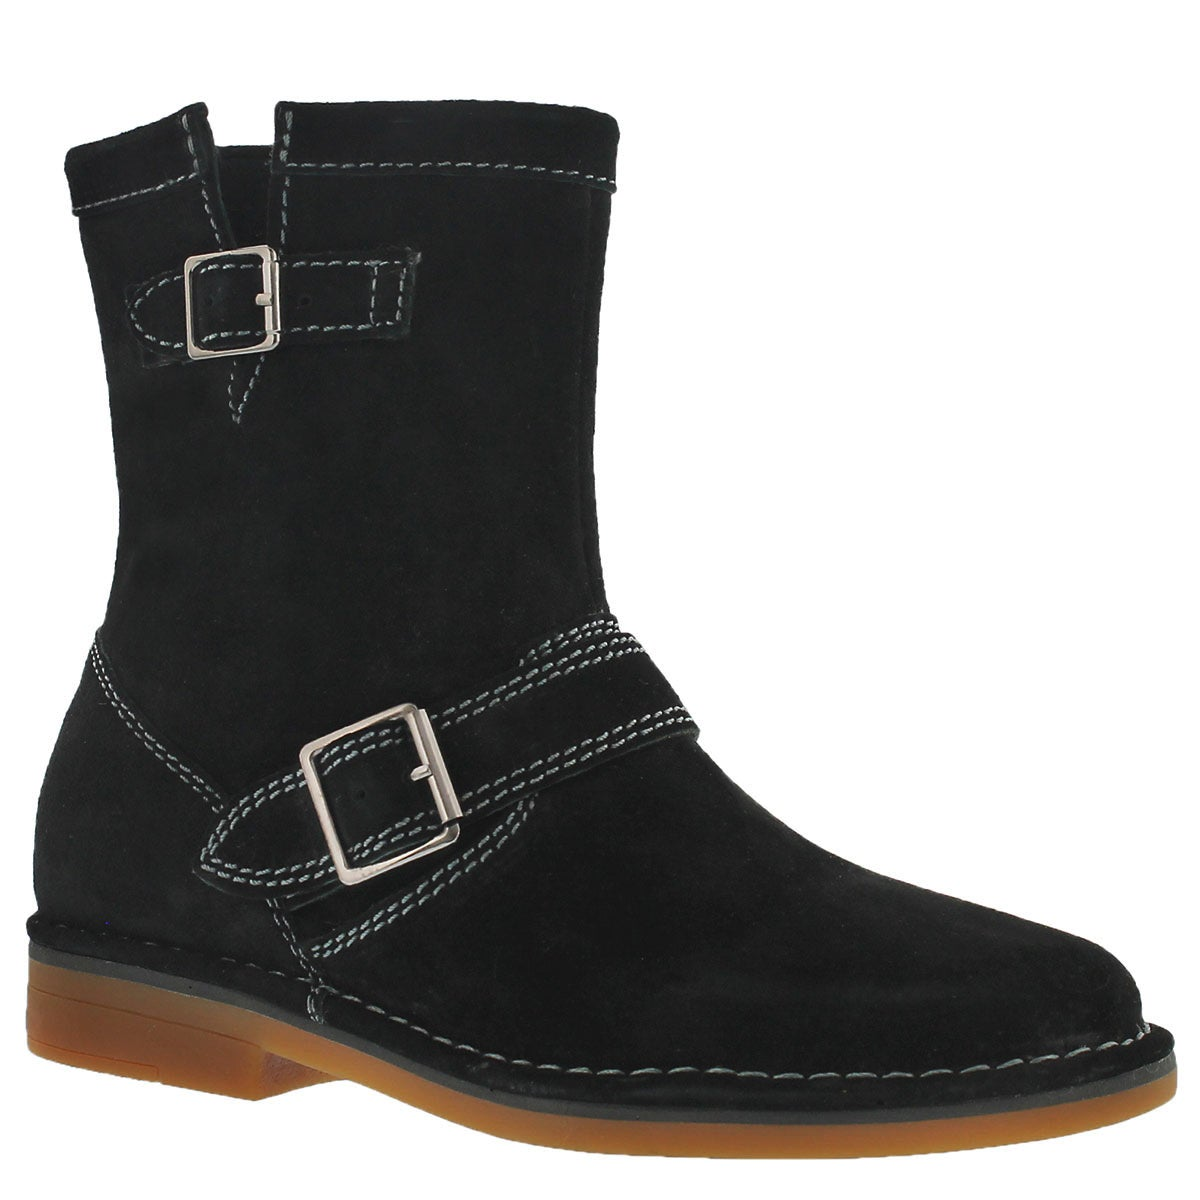 Women's AYDIN CATELYN black ankle boots